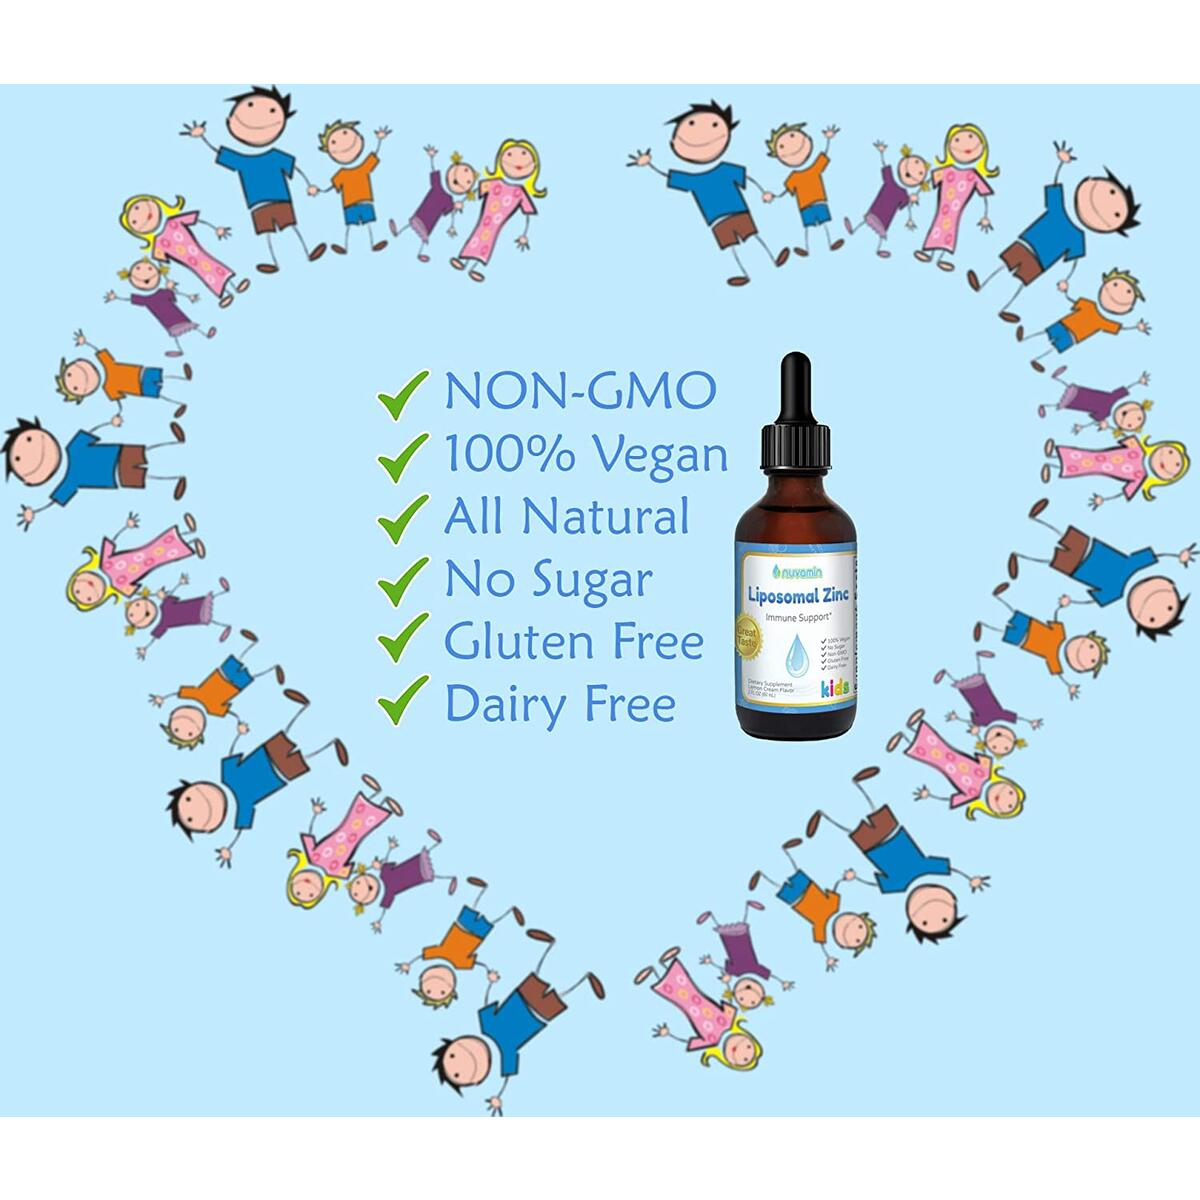 Nuvamin Organic Liquid Liposomal Zinc Drops 2Fl. Oz (60ml). Babies & Children Supplement. All Natural, Easy Absorption, High Bioavailability, Long Durability (2-8 Month of Supply), Lemon Cream Flavor